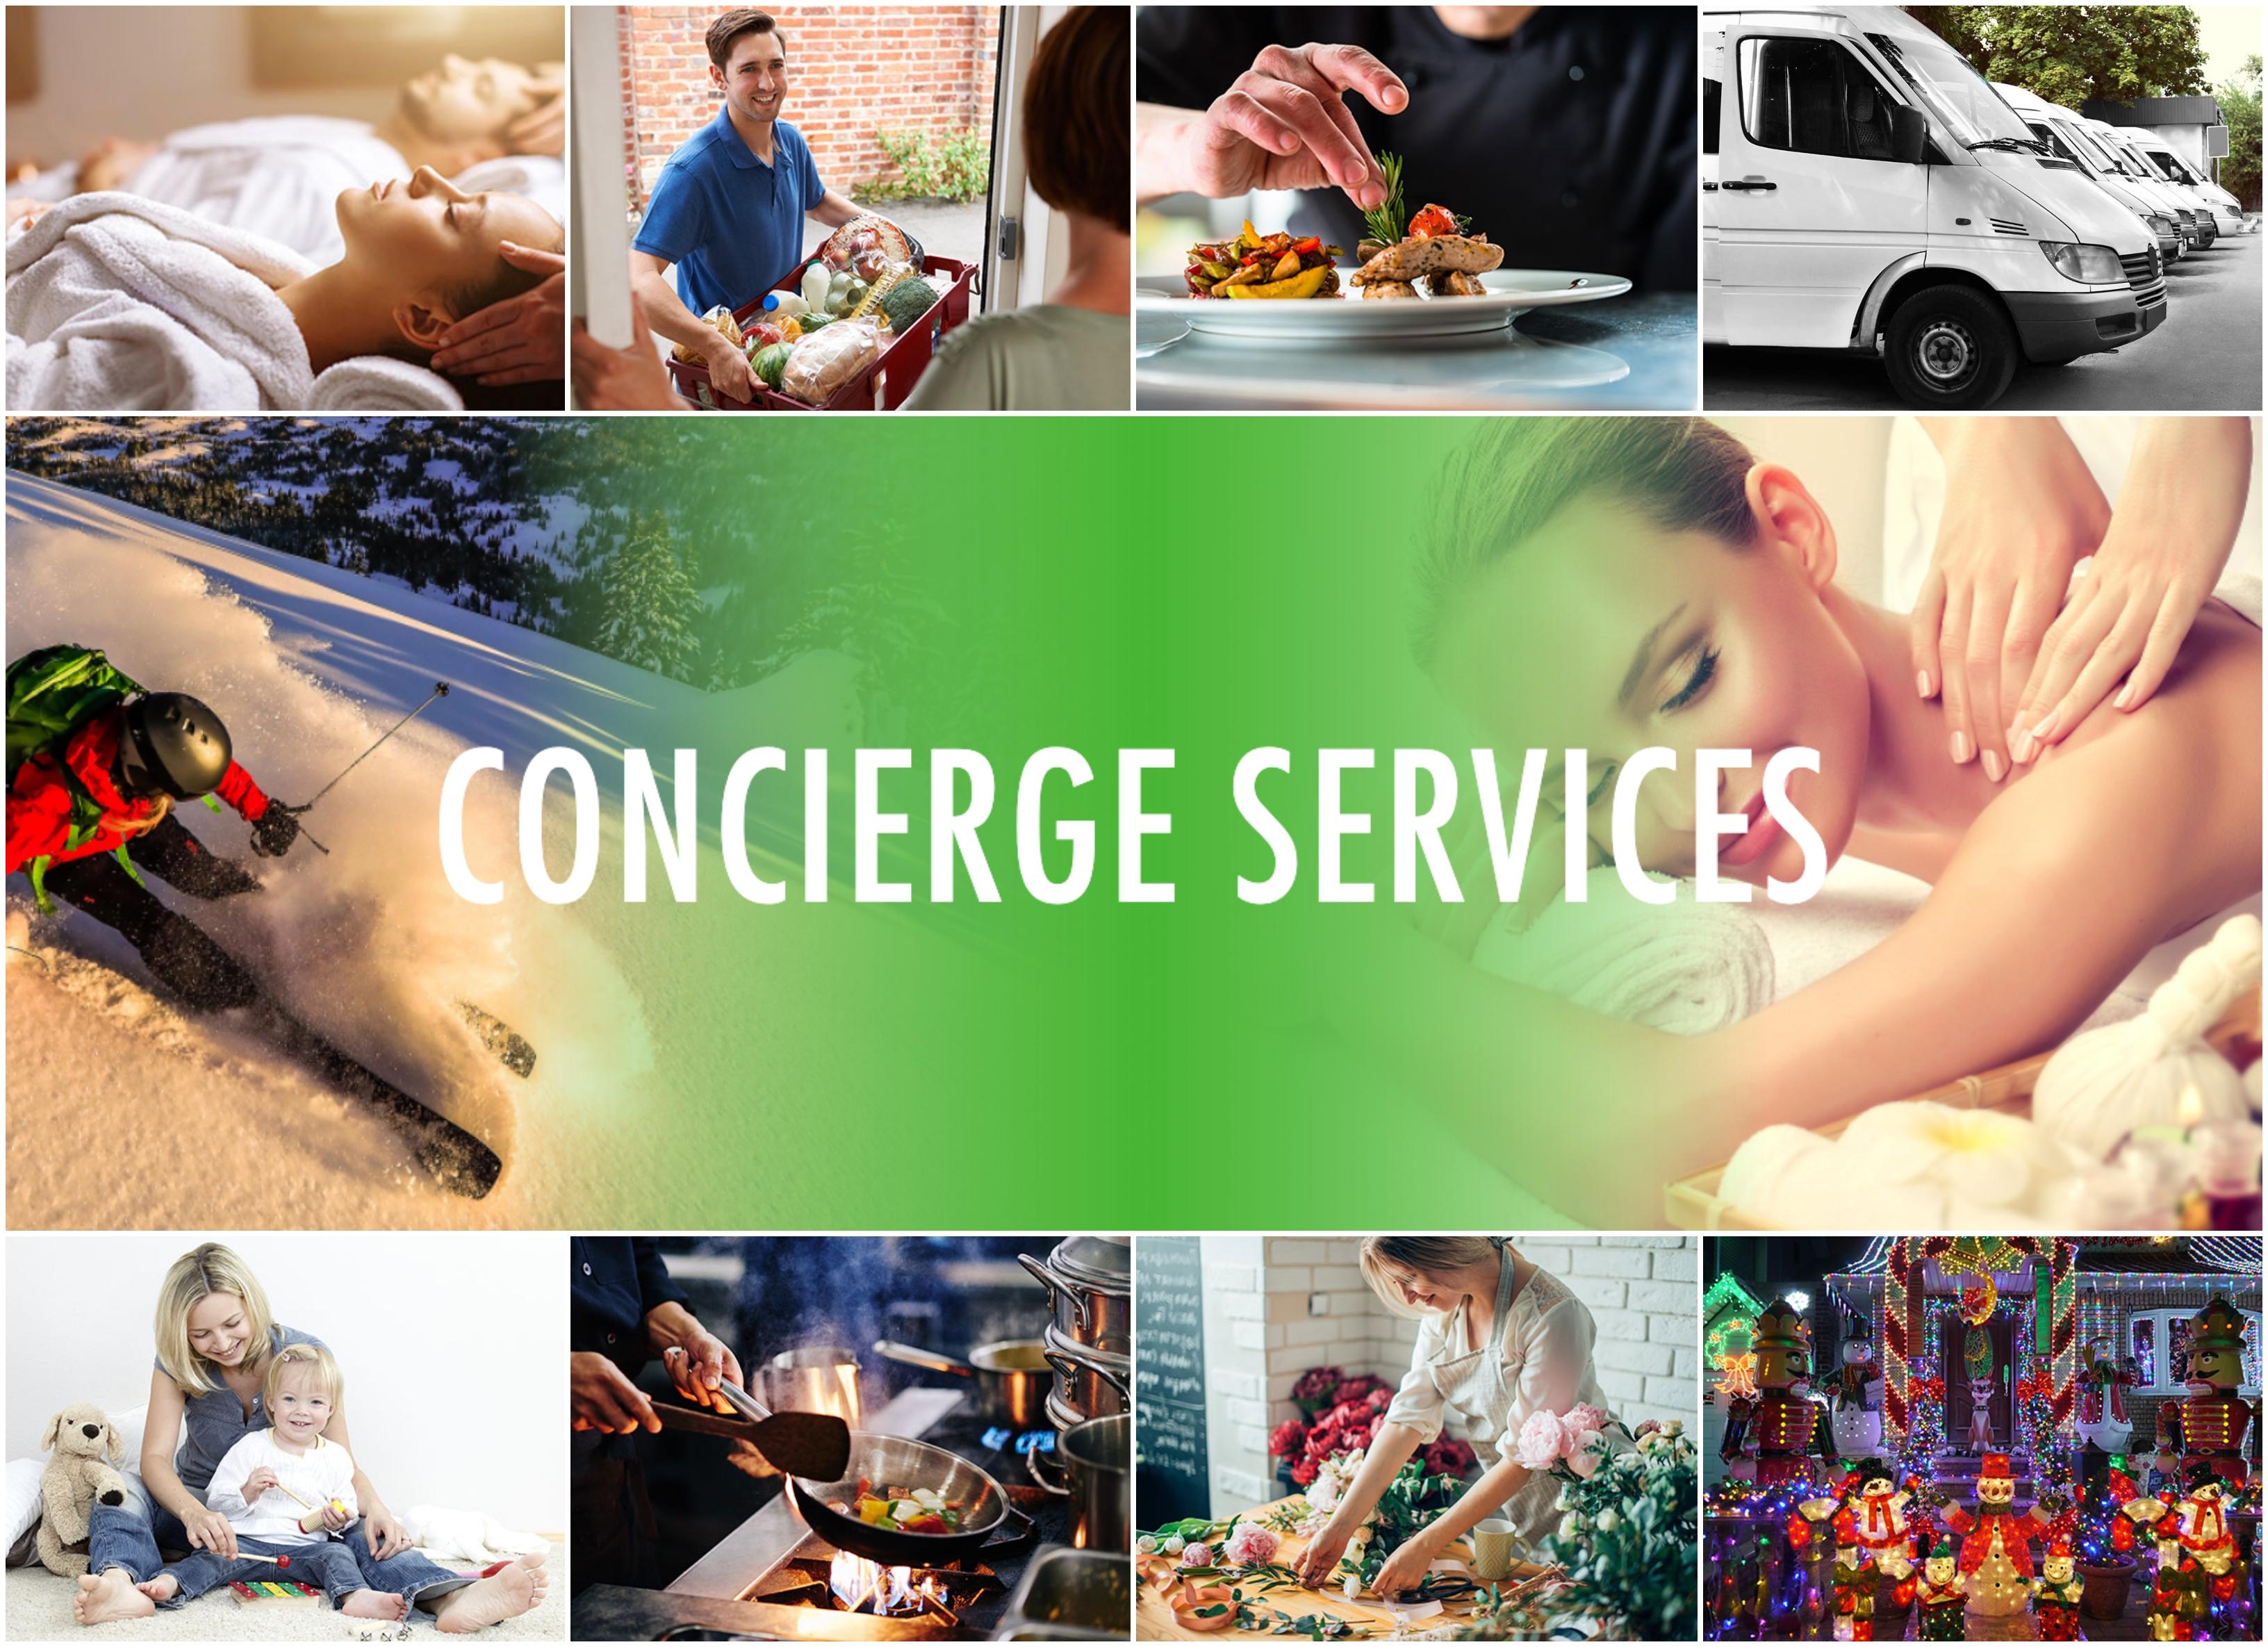 Discounted concierge services